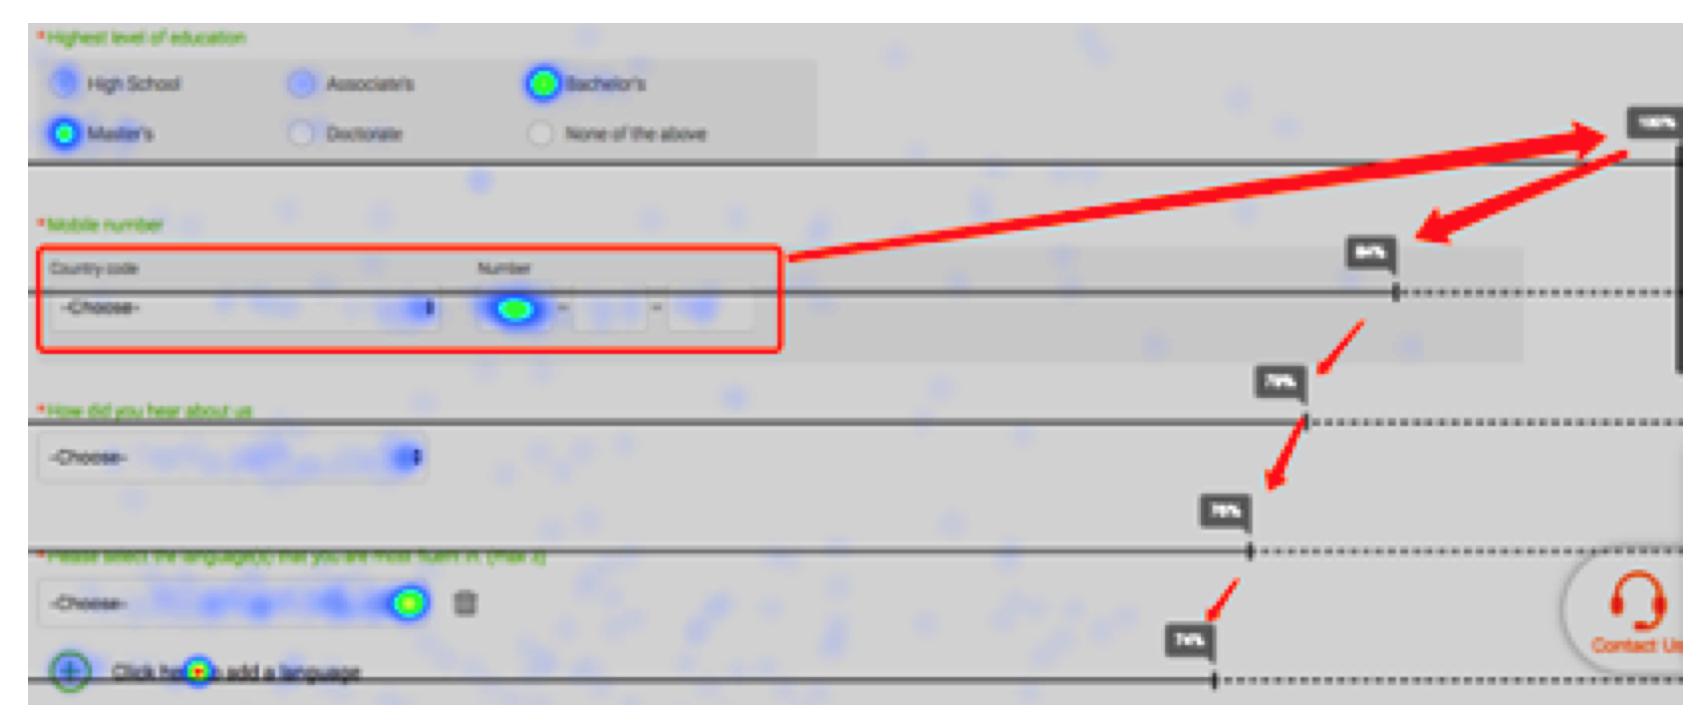 Optimizing using heatmap analysis of Ptengine by VIPKID